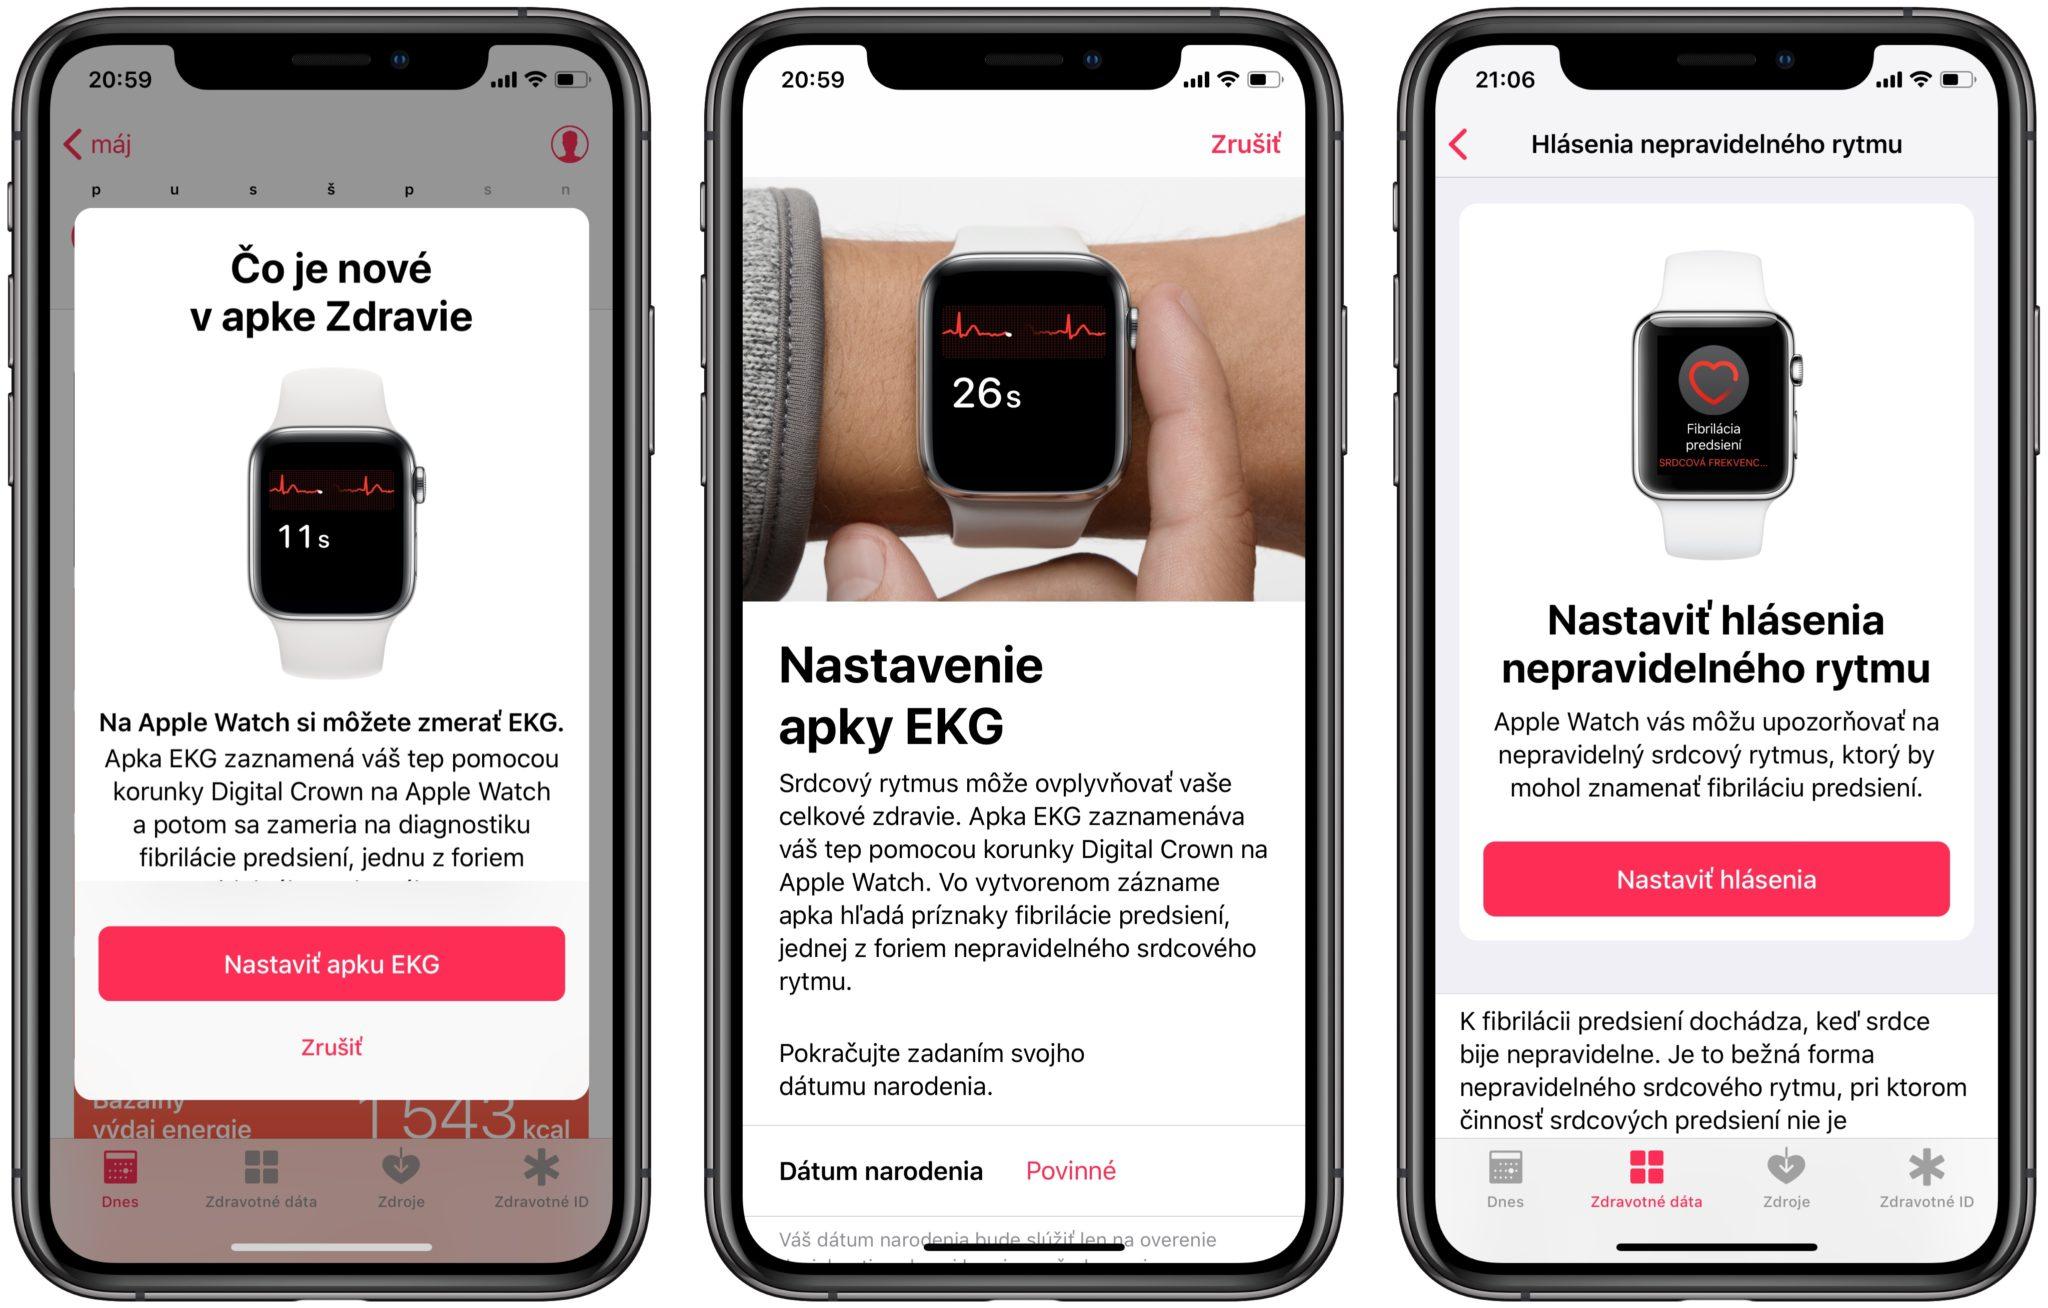 apple watch ako nastavit ekg - Návod: Ako na meranie EKG s Apple Watch